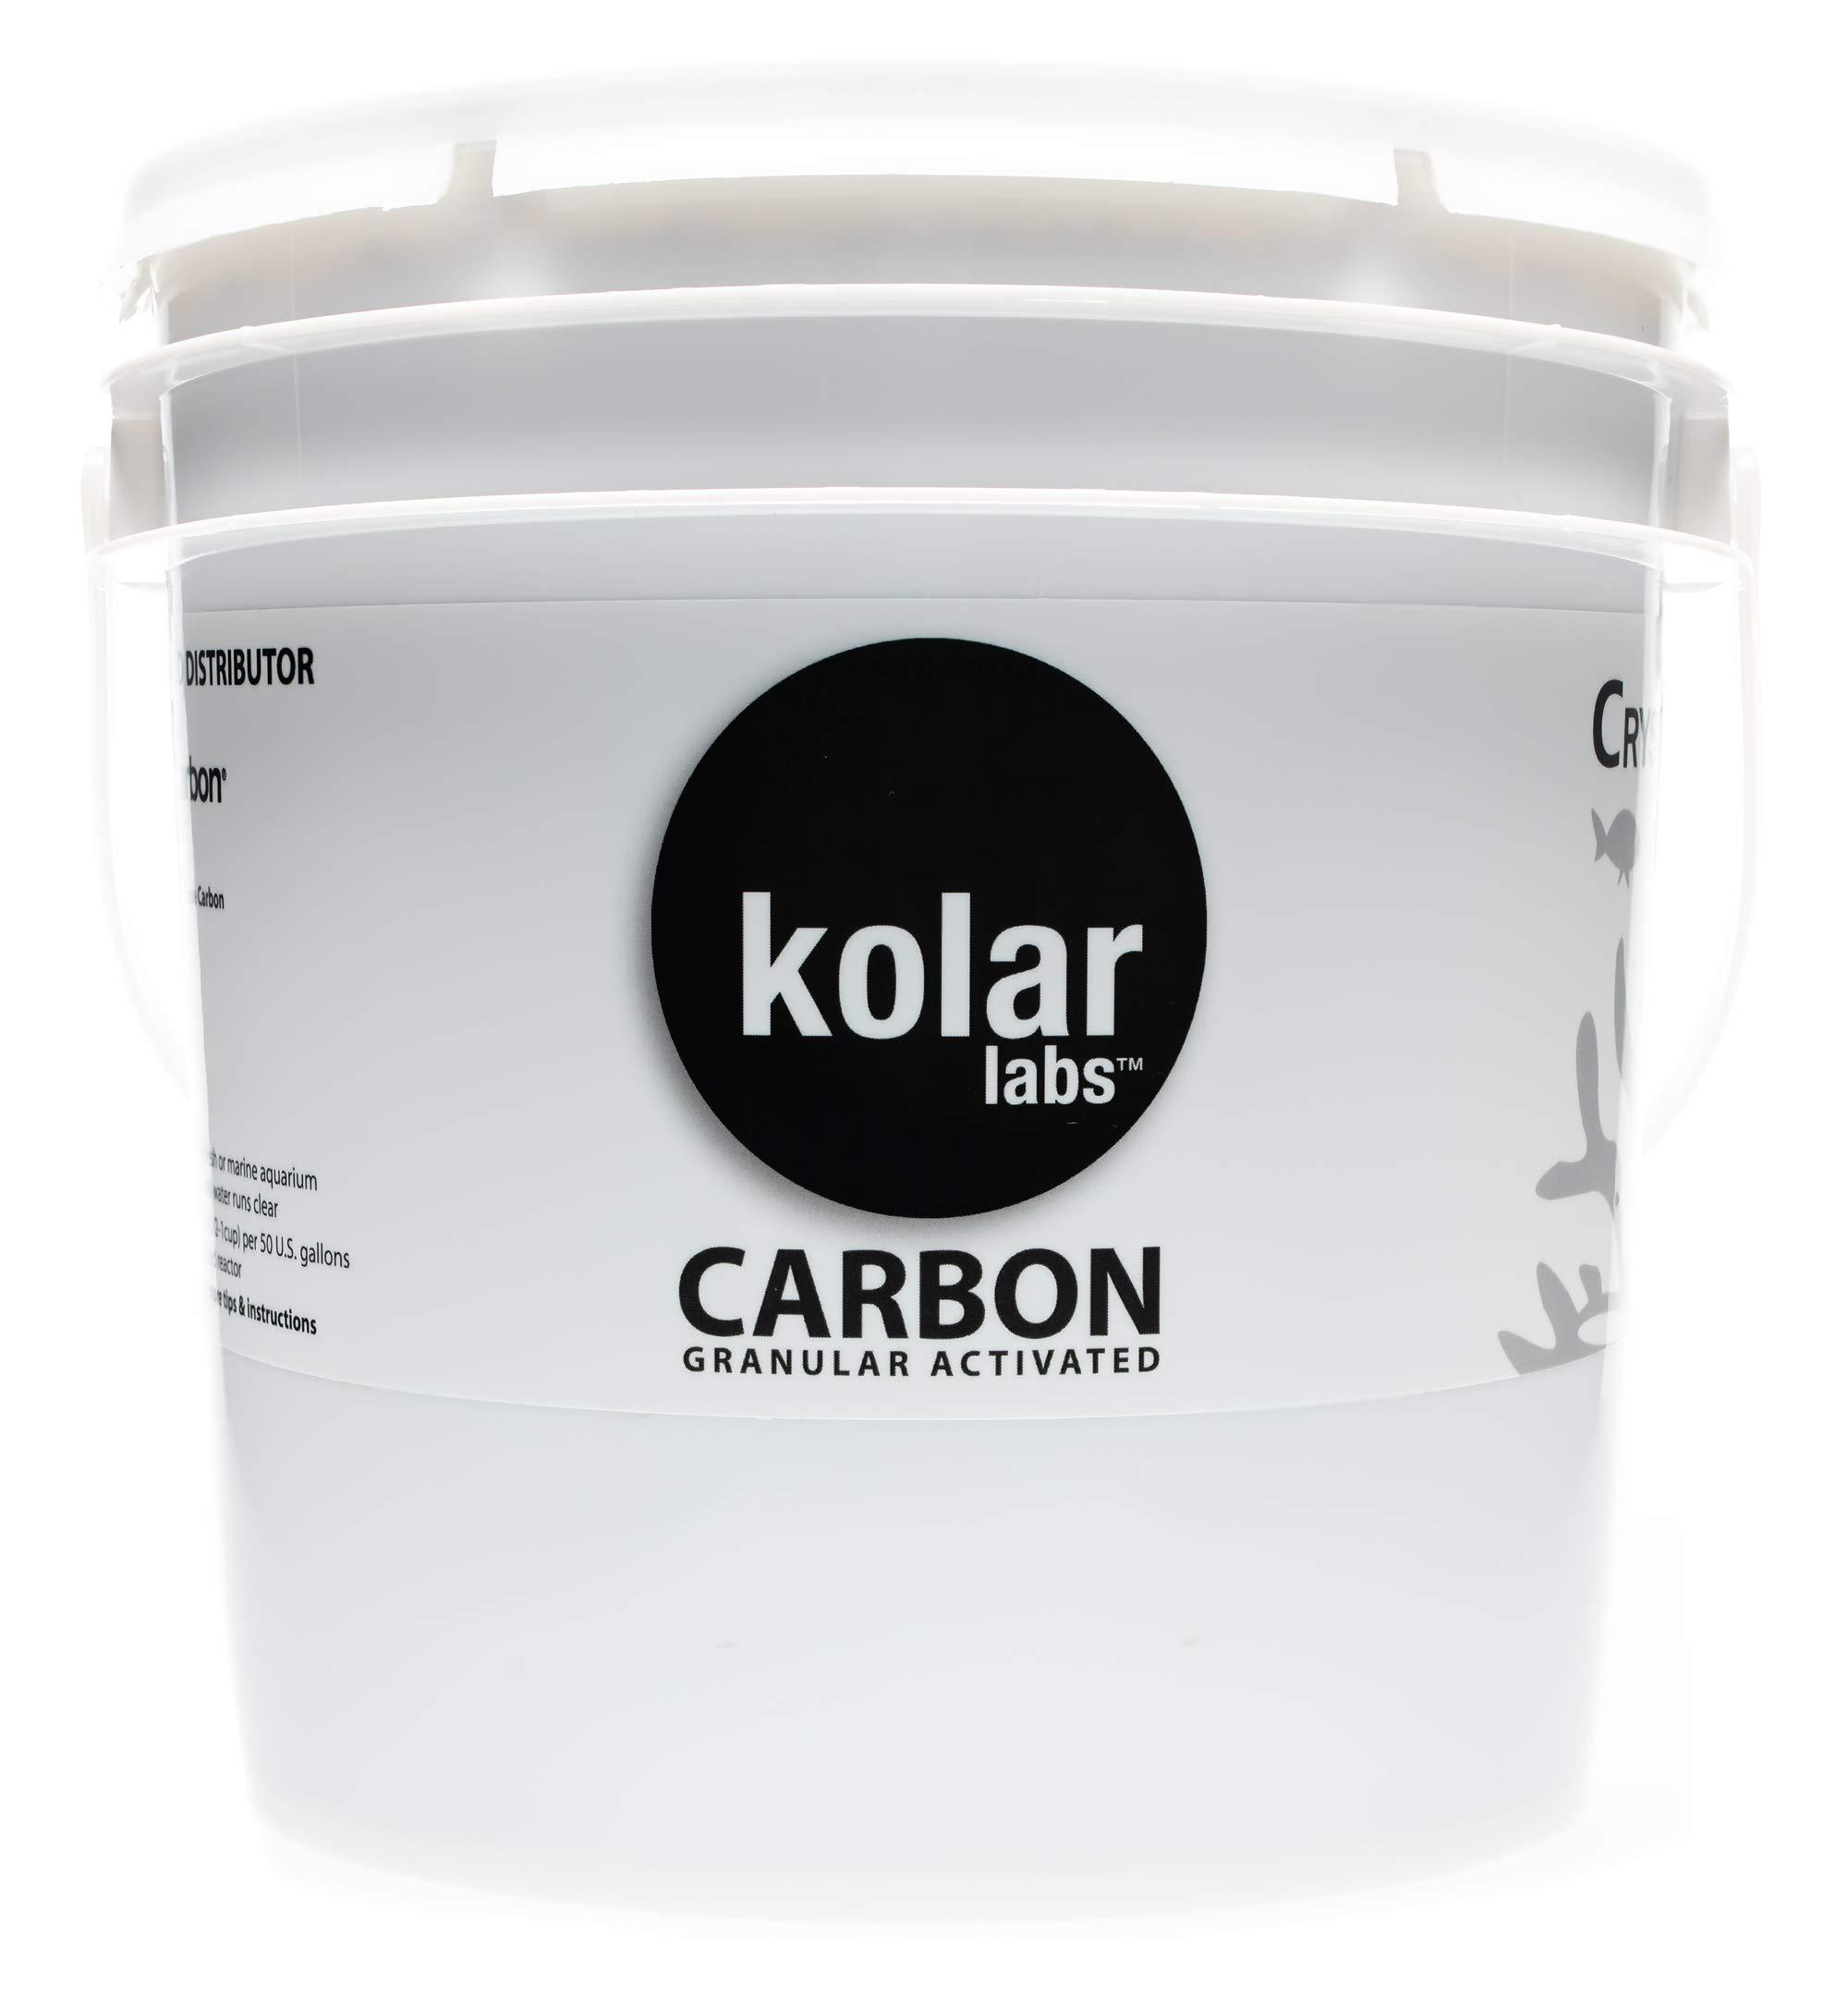 CRYSTAL CAL Aquarium Carbon, GAC 1.3 kilo(3lbs), reef grade, CALGON CARBON by Kolar Labs